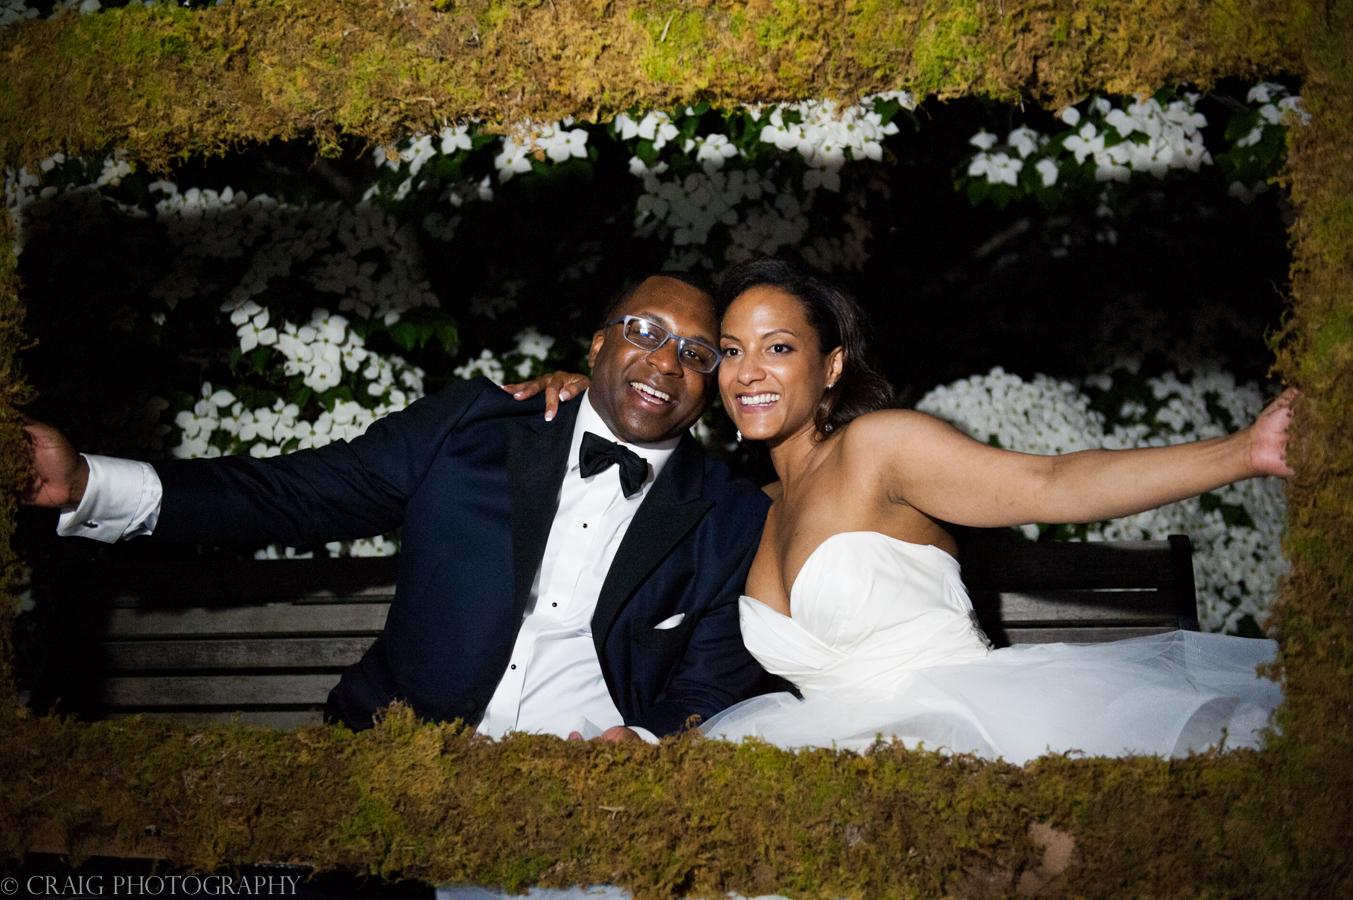 Phipps Conseratory Weddings | Wedding Photo Booth Homemade Moss Frame-0015